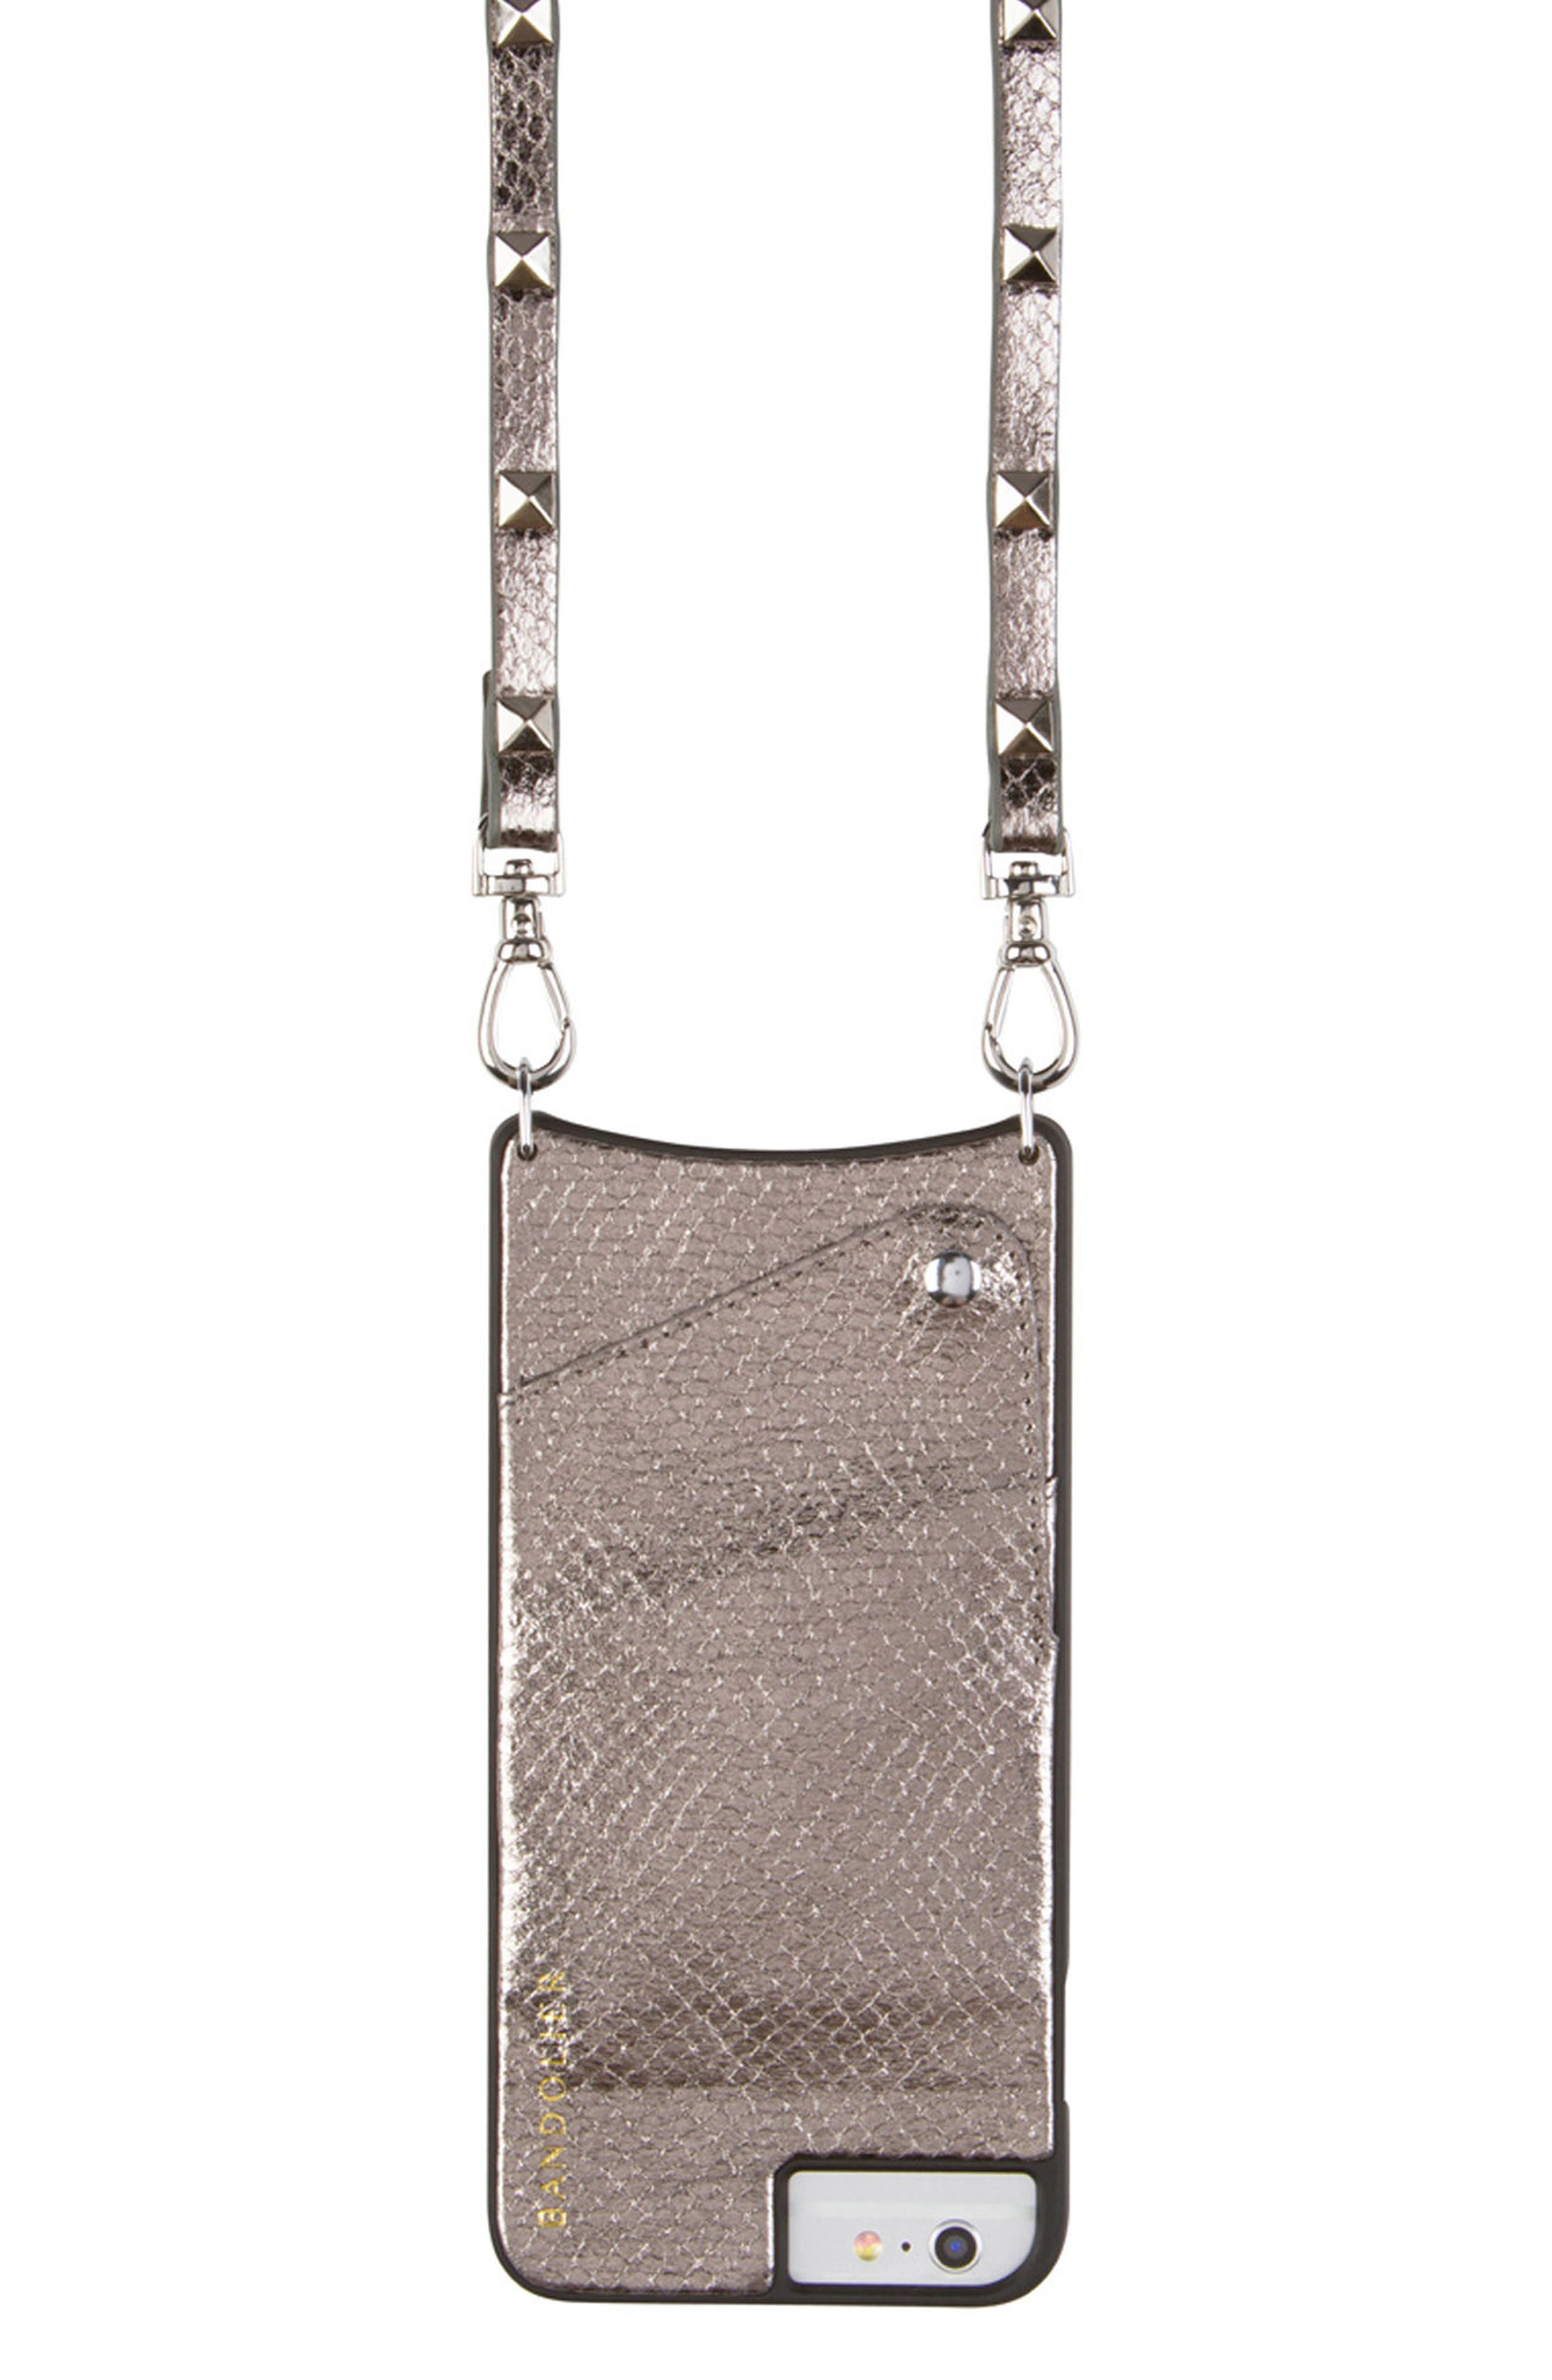 Sarah Metallic Faux Snakeskin iPhone 6/7/8 & 6/7/8 Plus Crossbody Case,                         Main,                         color, PEWTER/ SILVER